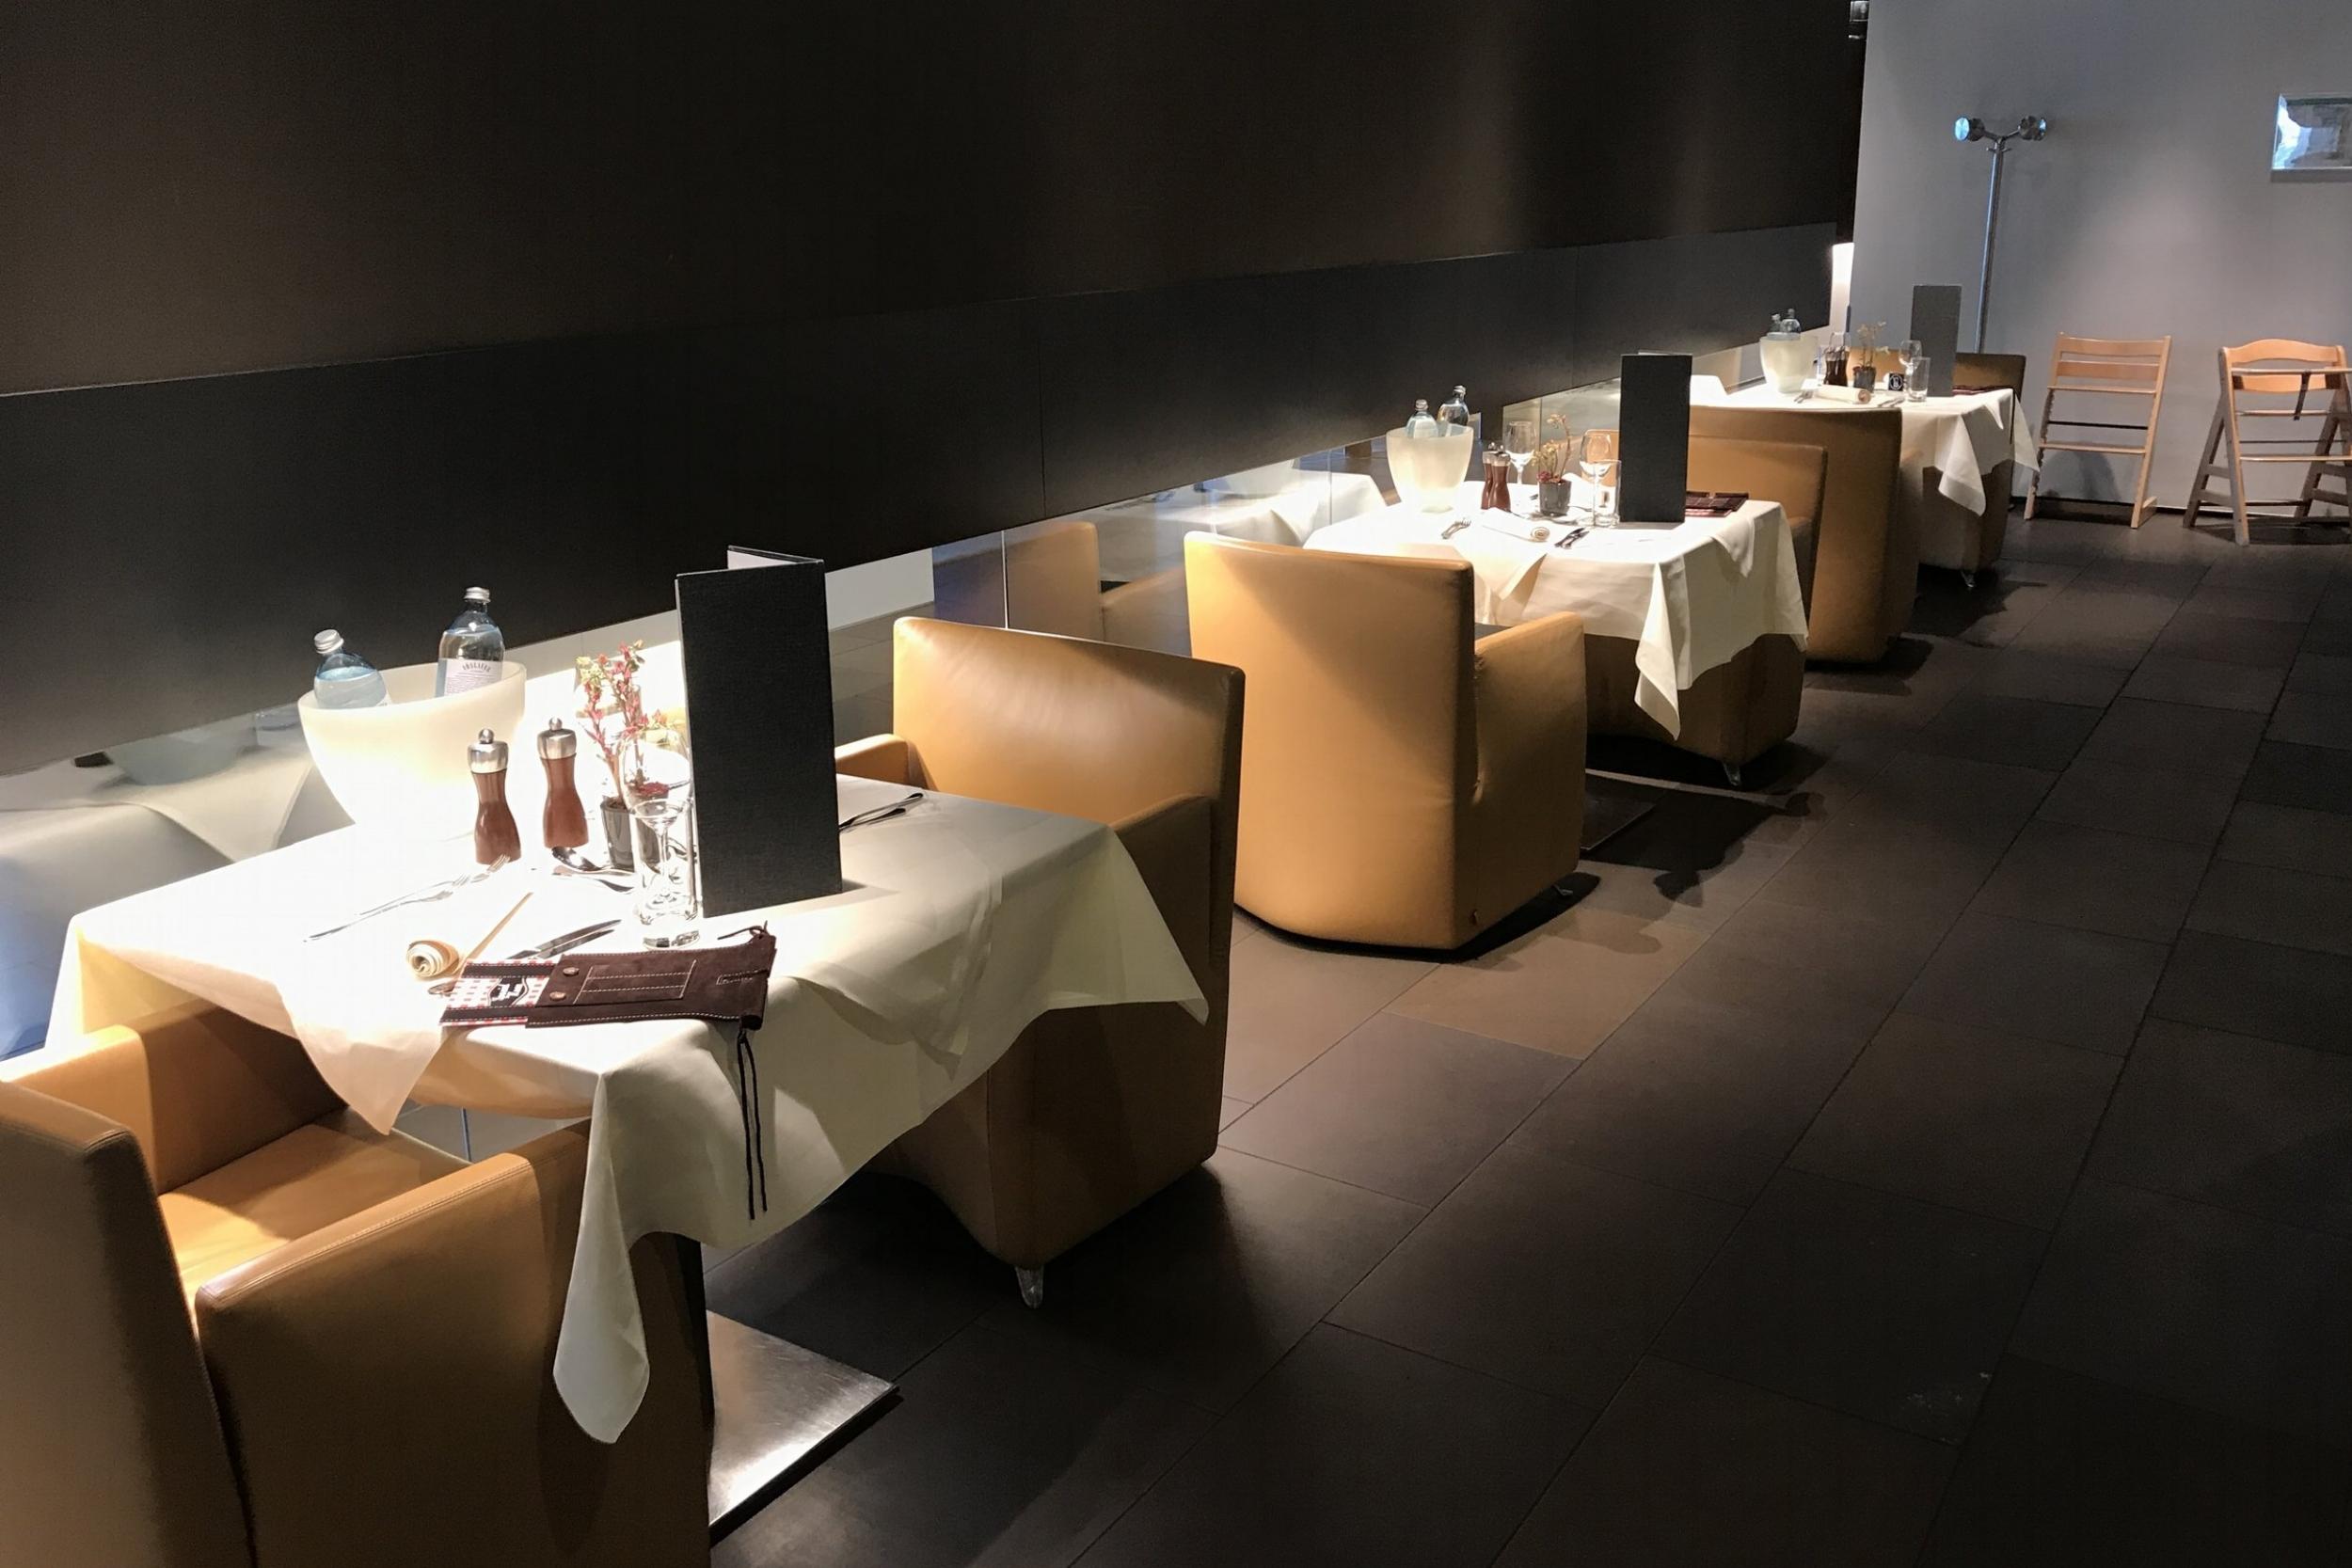 Lufthansa First Class Terminal Frankfurt – Dining area